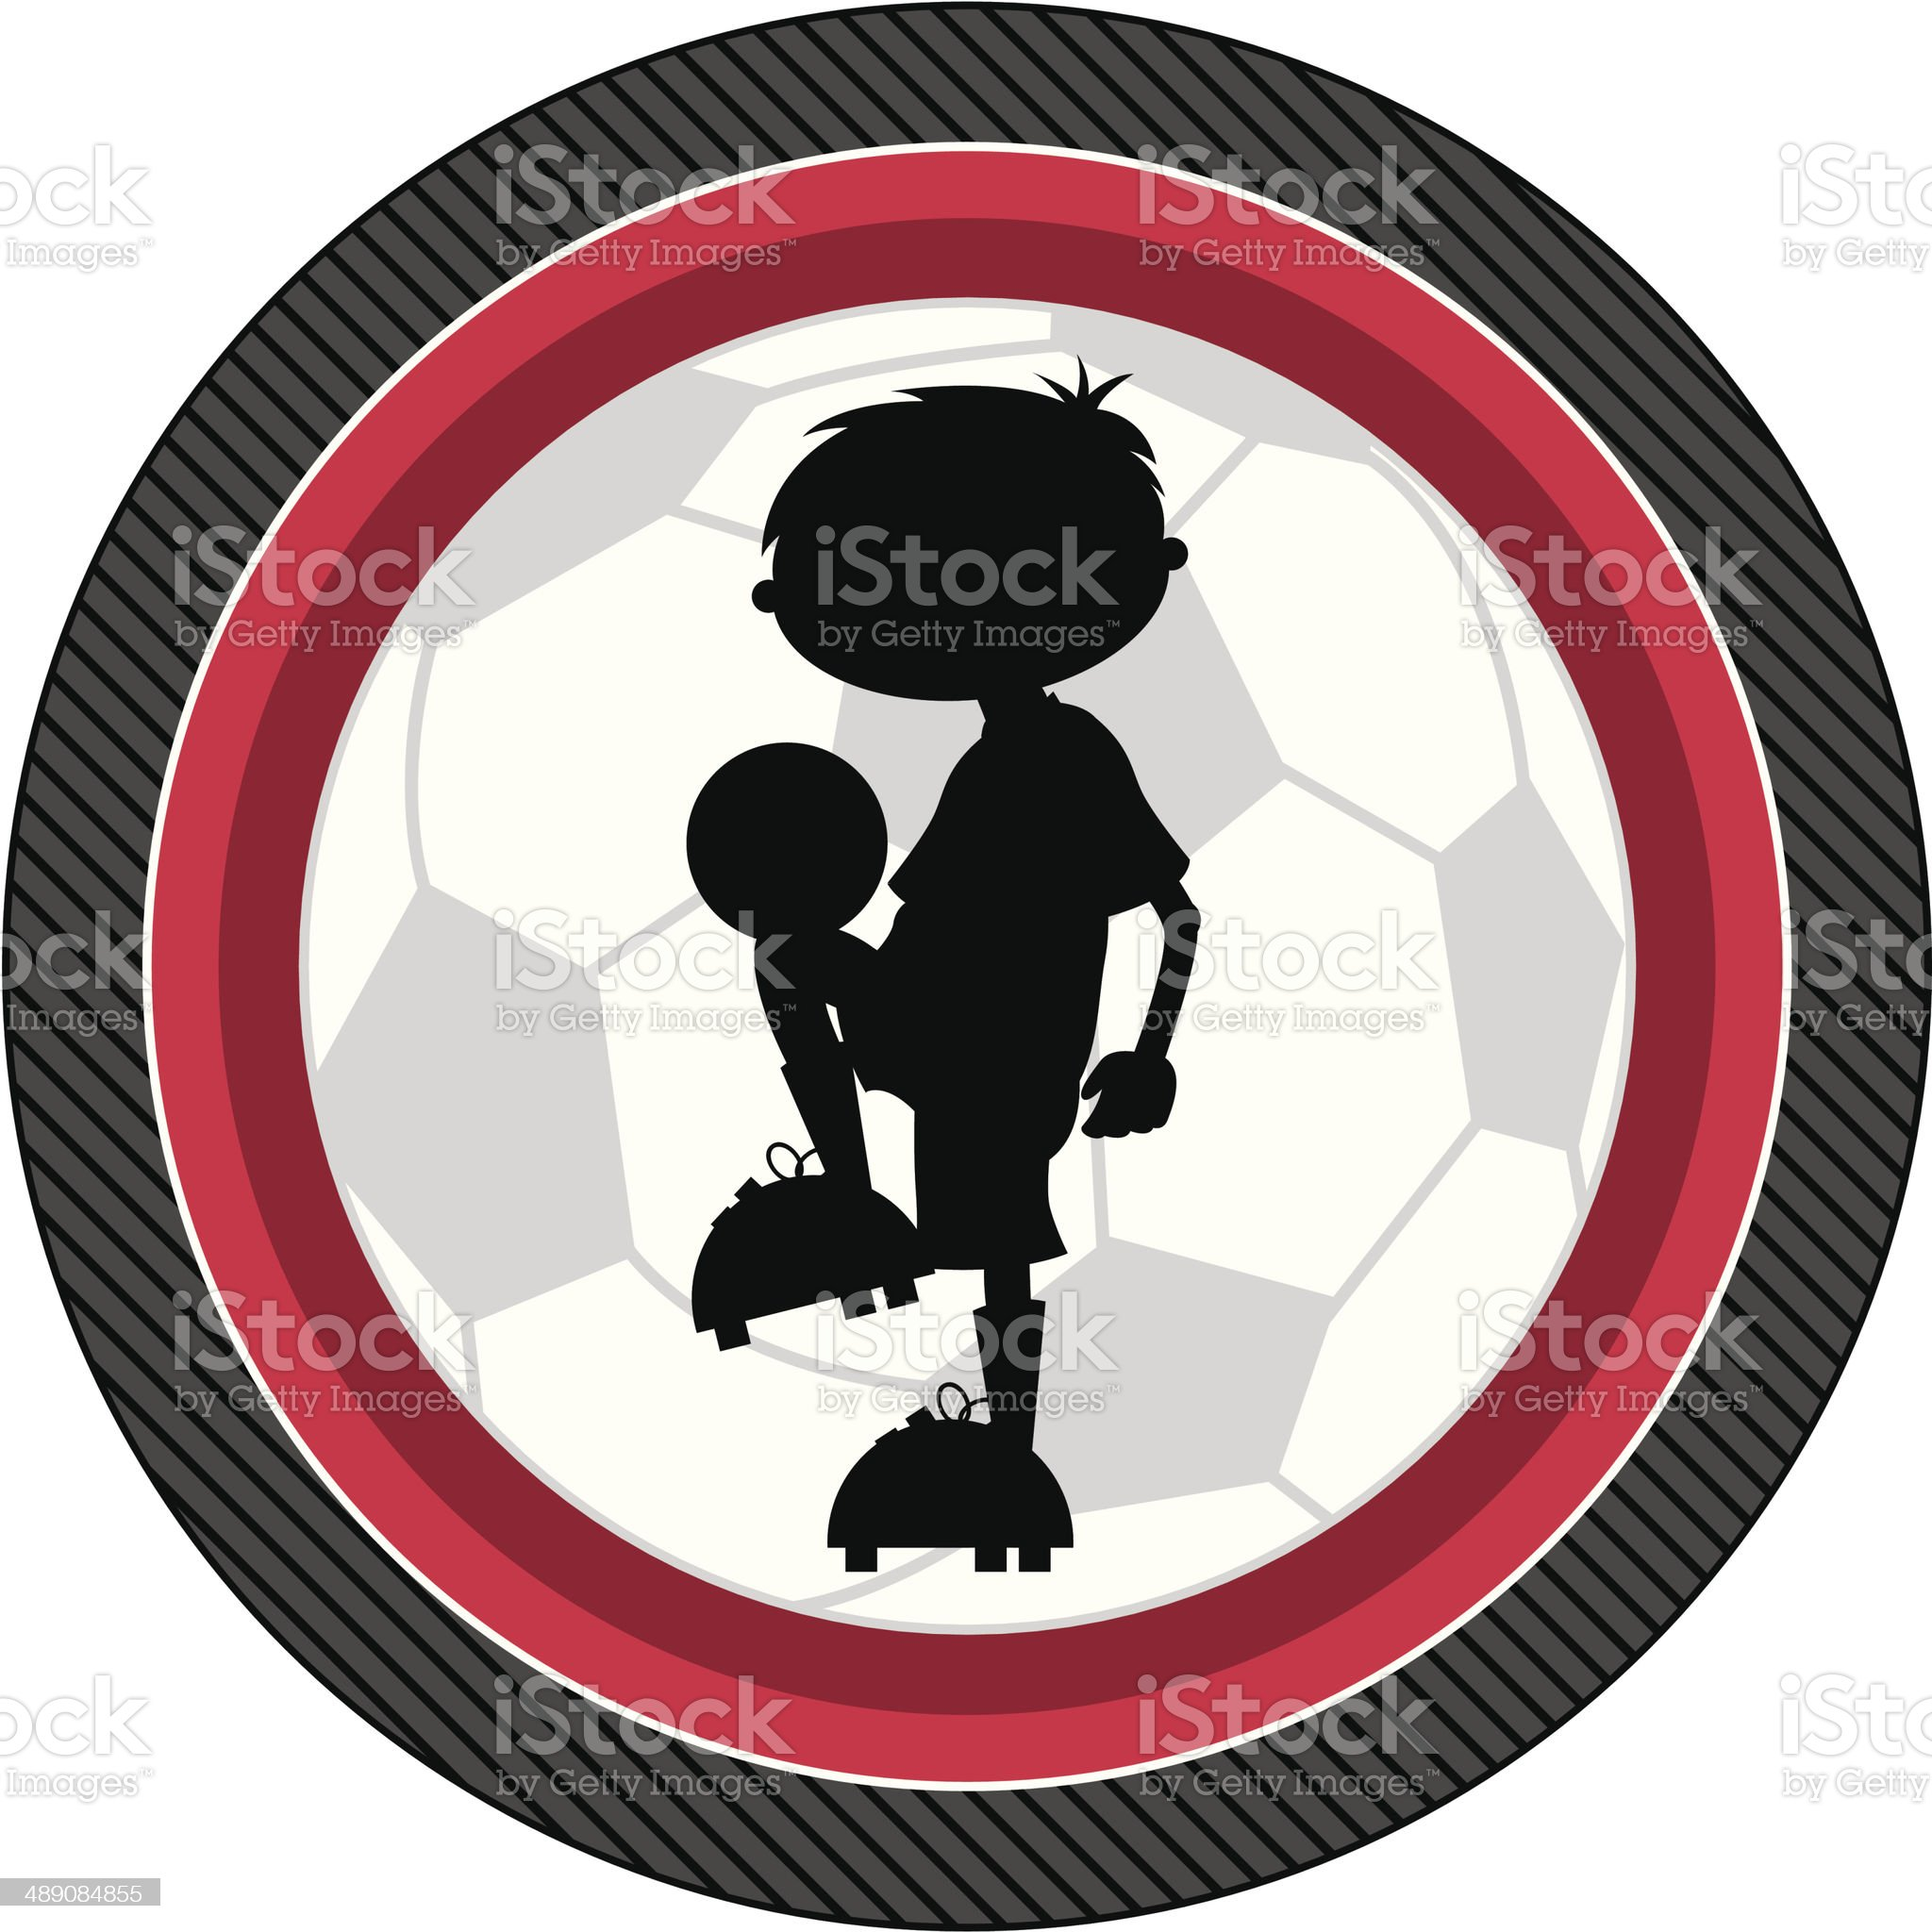 Soccer Football Boy Silhouette royalty-free stock vector art